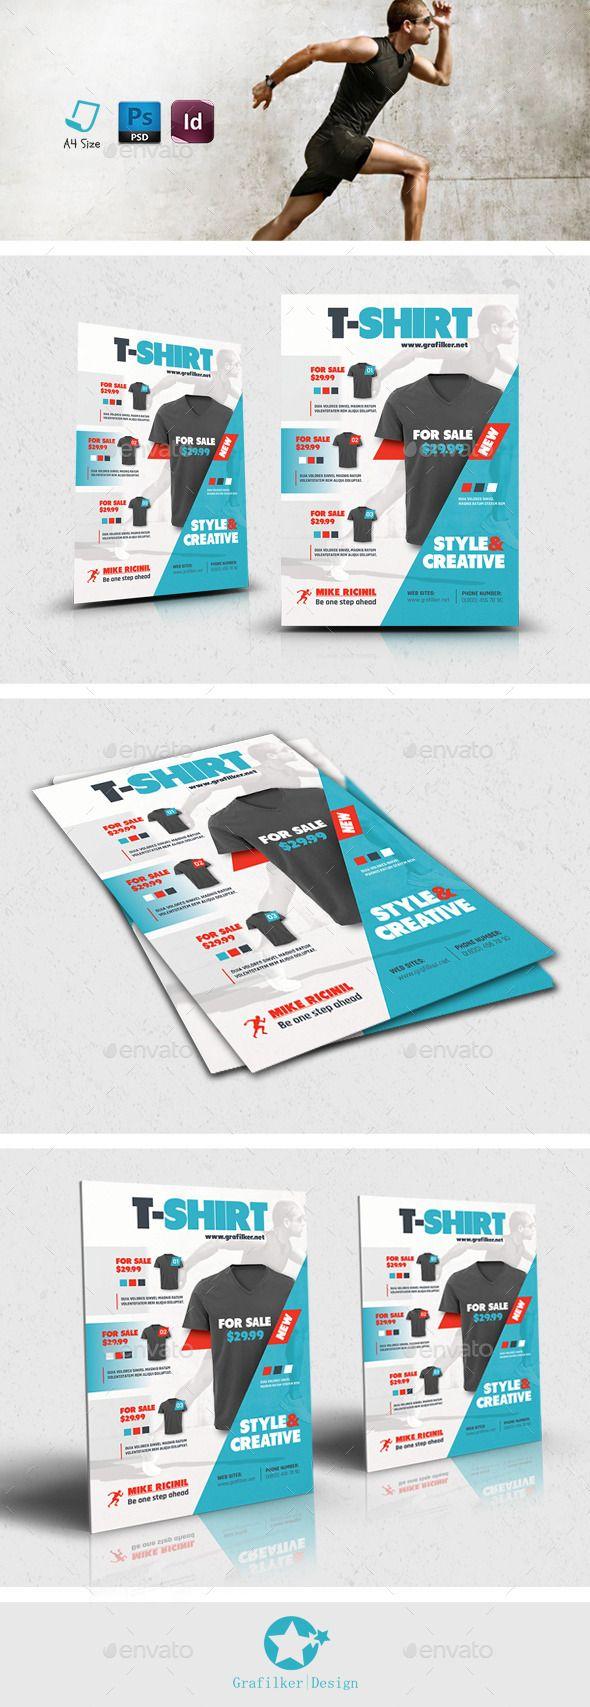 T Shirt Design Contest Maketing Flyers Inksoft Contest Design Flyer Sale Flyer